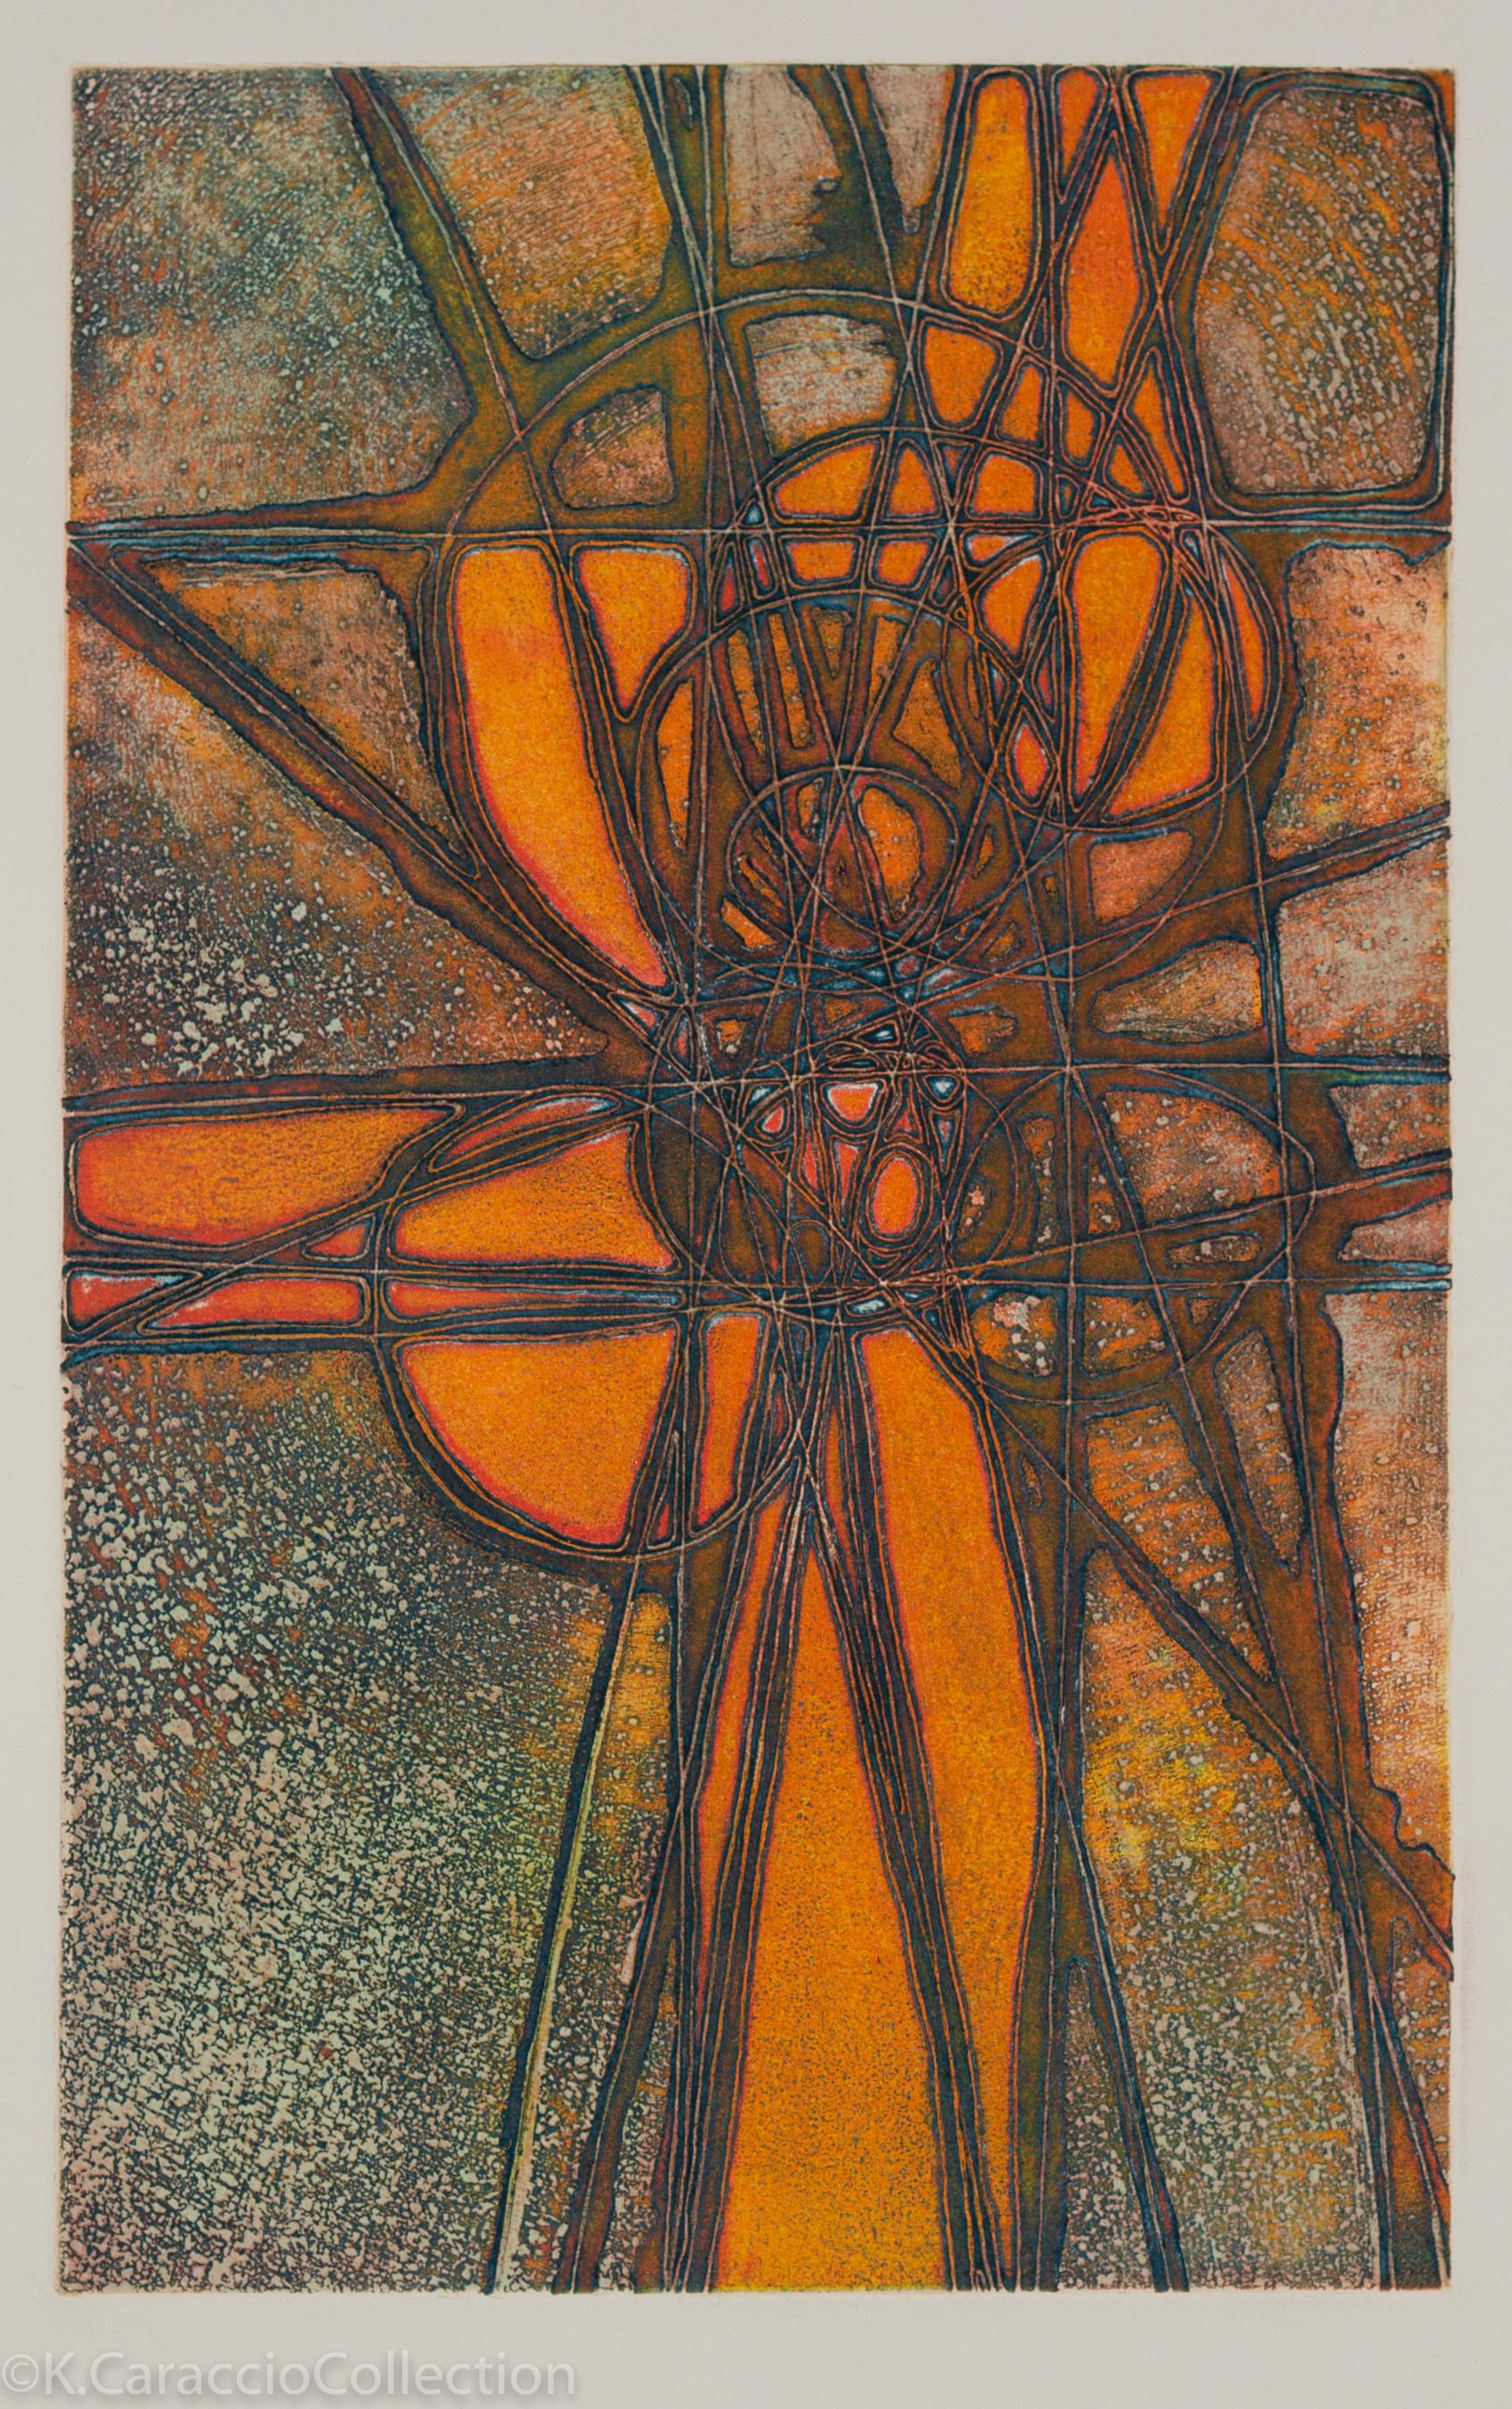 Universe, 1972